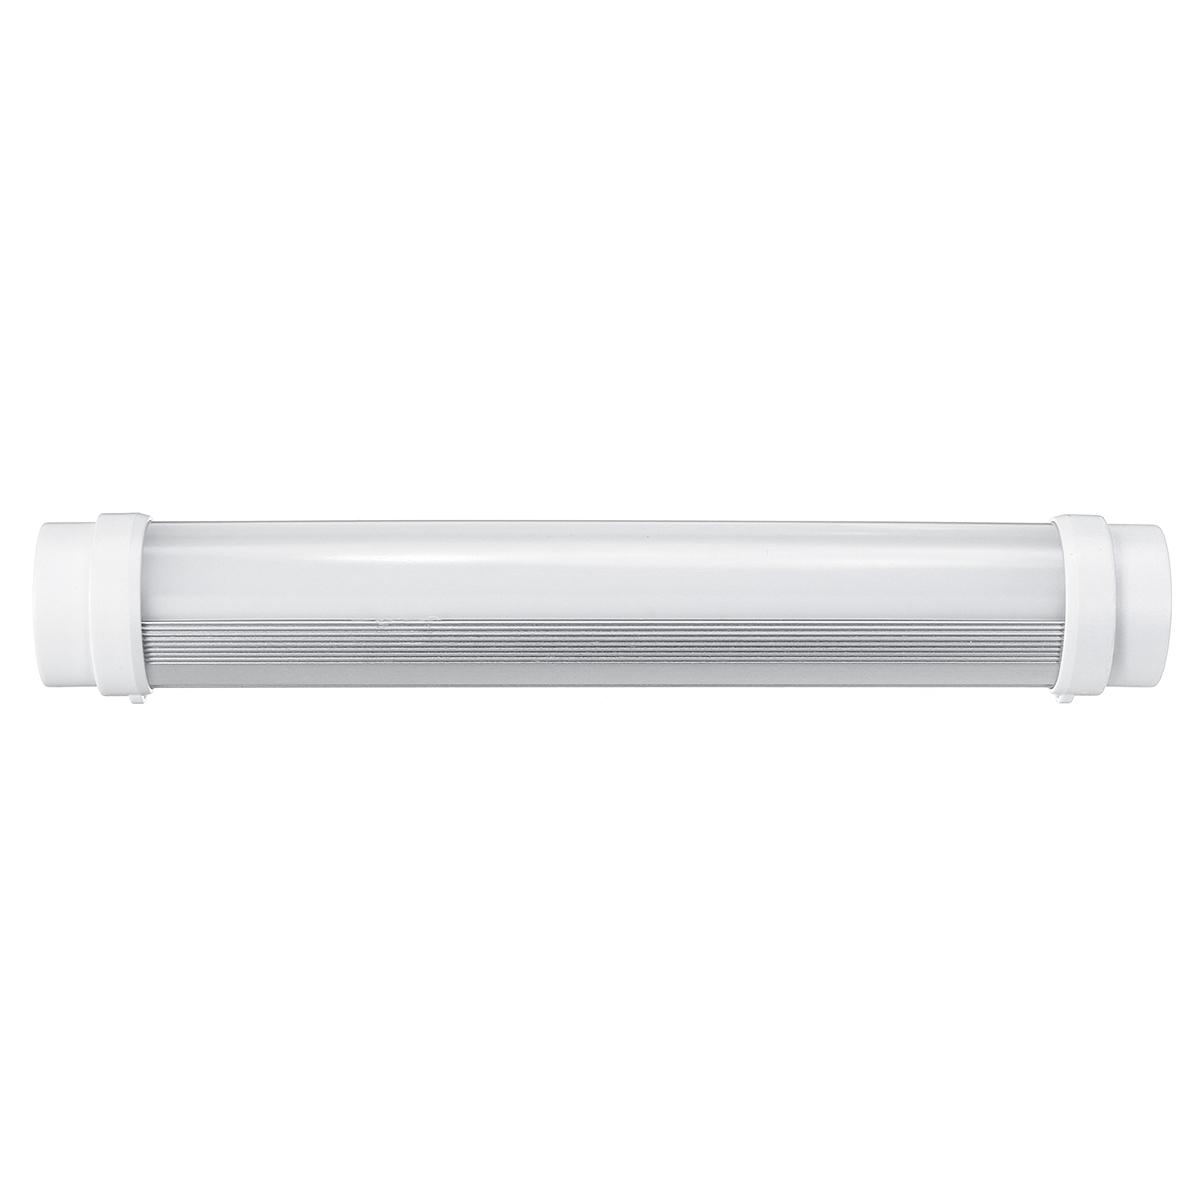 Outdoor Camping Tent LED Lamp Emergency Tube Bar Flashlight USB Charger 1800mAh  image 4